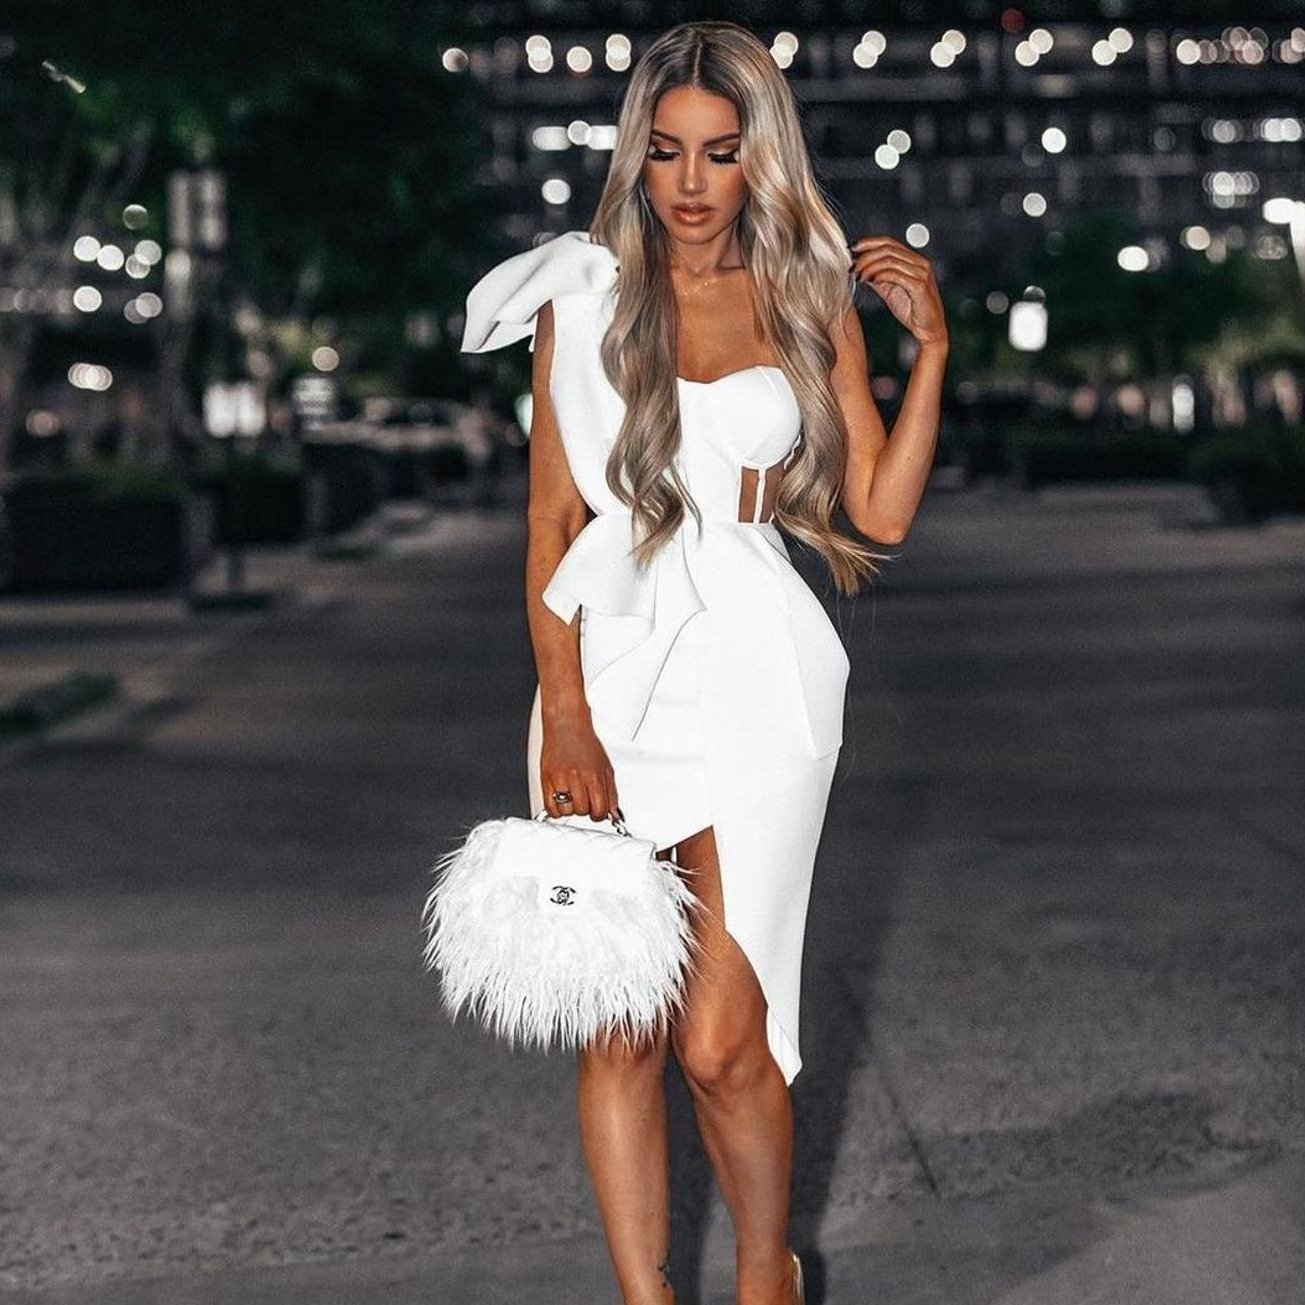 Mmer fashion women bodycon dress one shoulder bow mesh ruffle sleeveless bandage dress celebrity